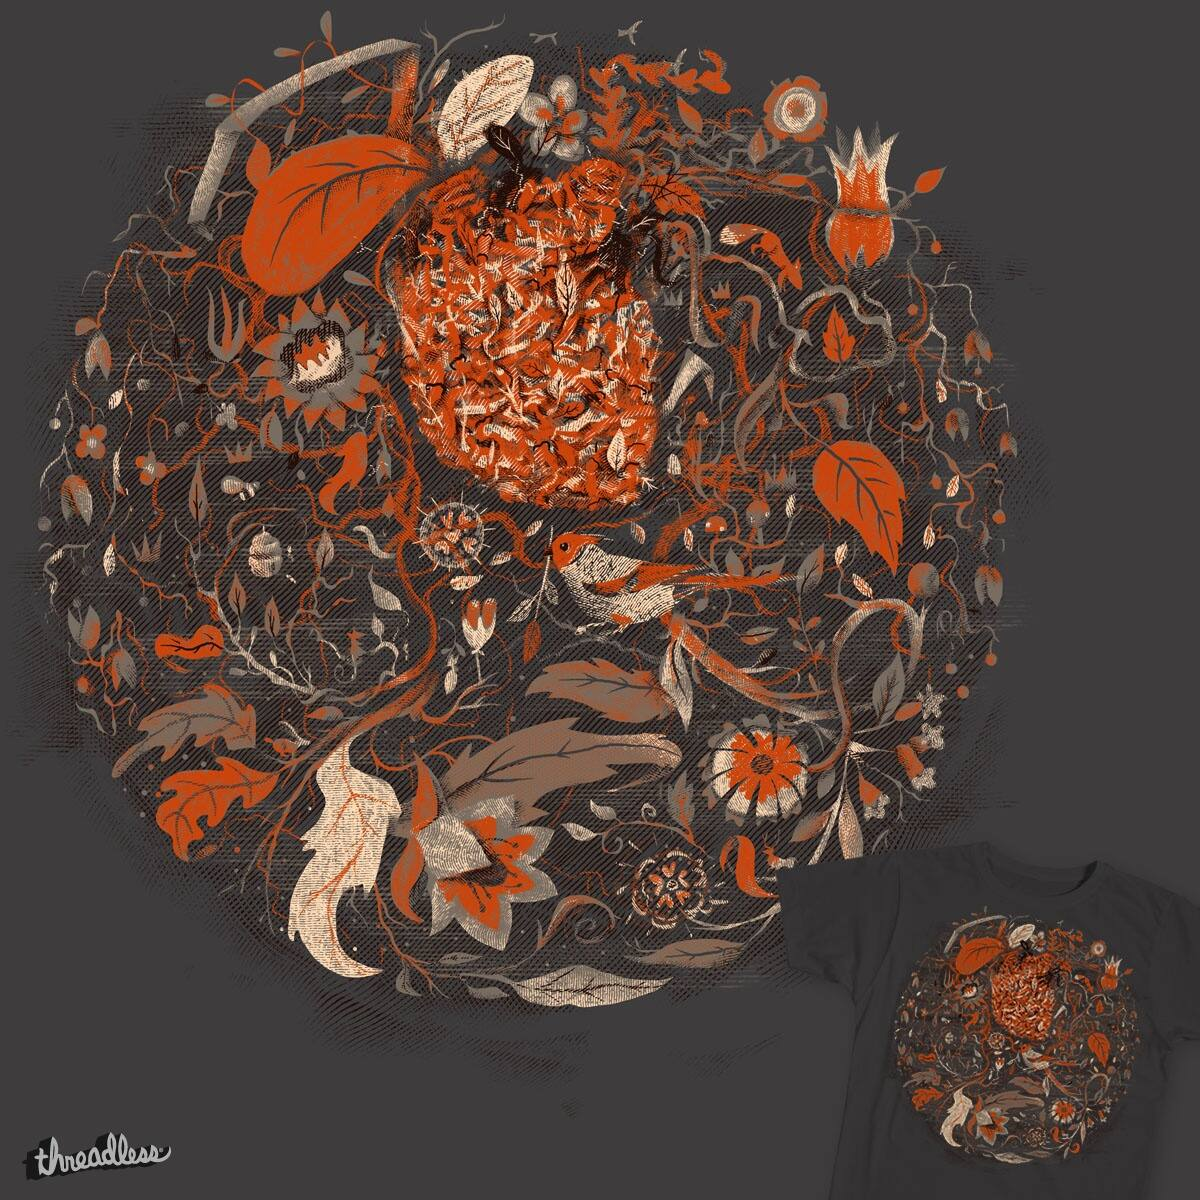 Wild at heart by heymonkeyriot on Threadless